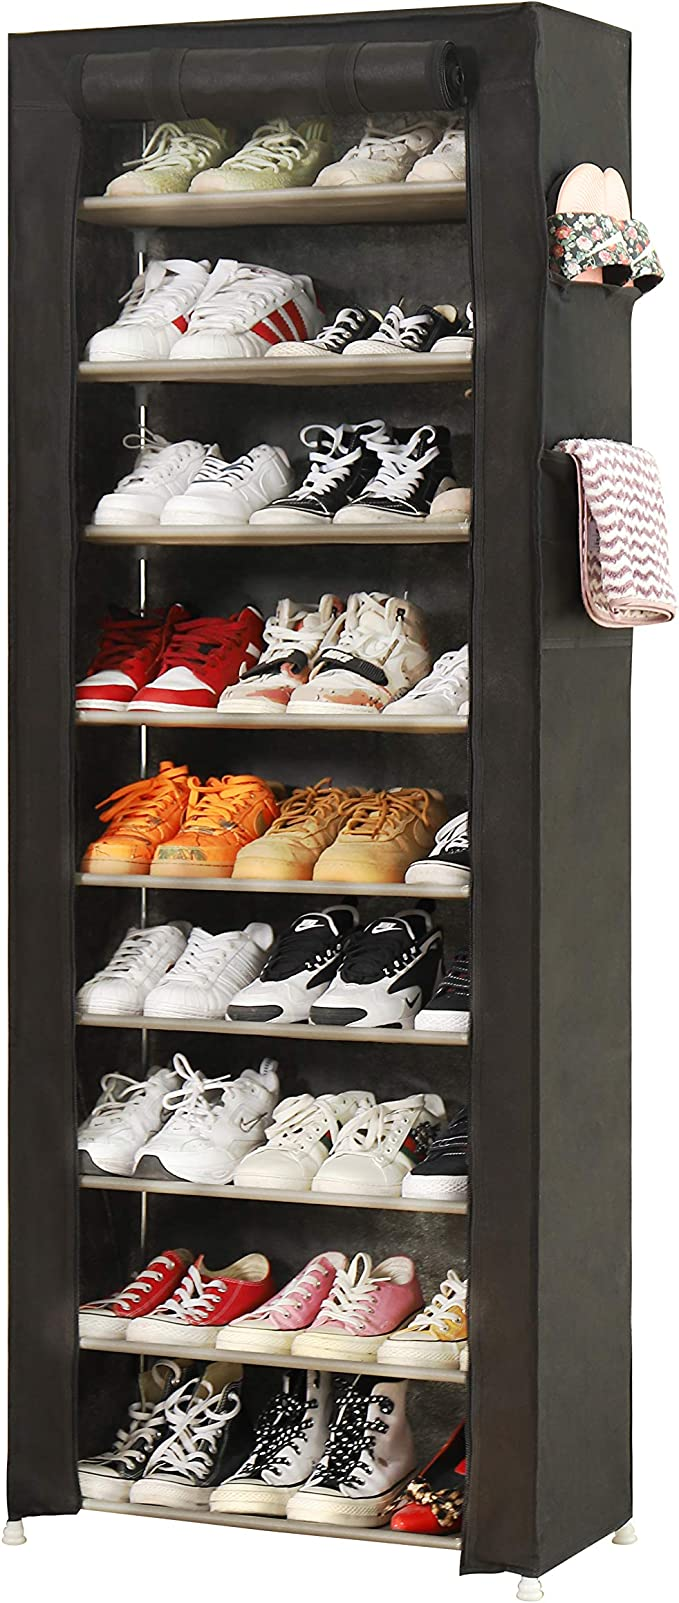 Pengke Large Shoe Rack Shoe Storage Organizer Cabinet Tower With Dustproof Cover Closet Shoe Cabinet Tower 9 Tiers Black Amazon Co Uk Diy Tools